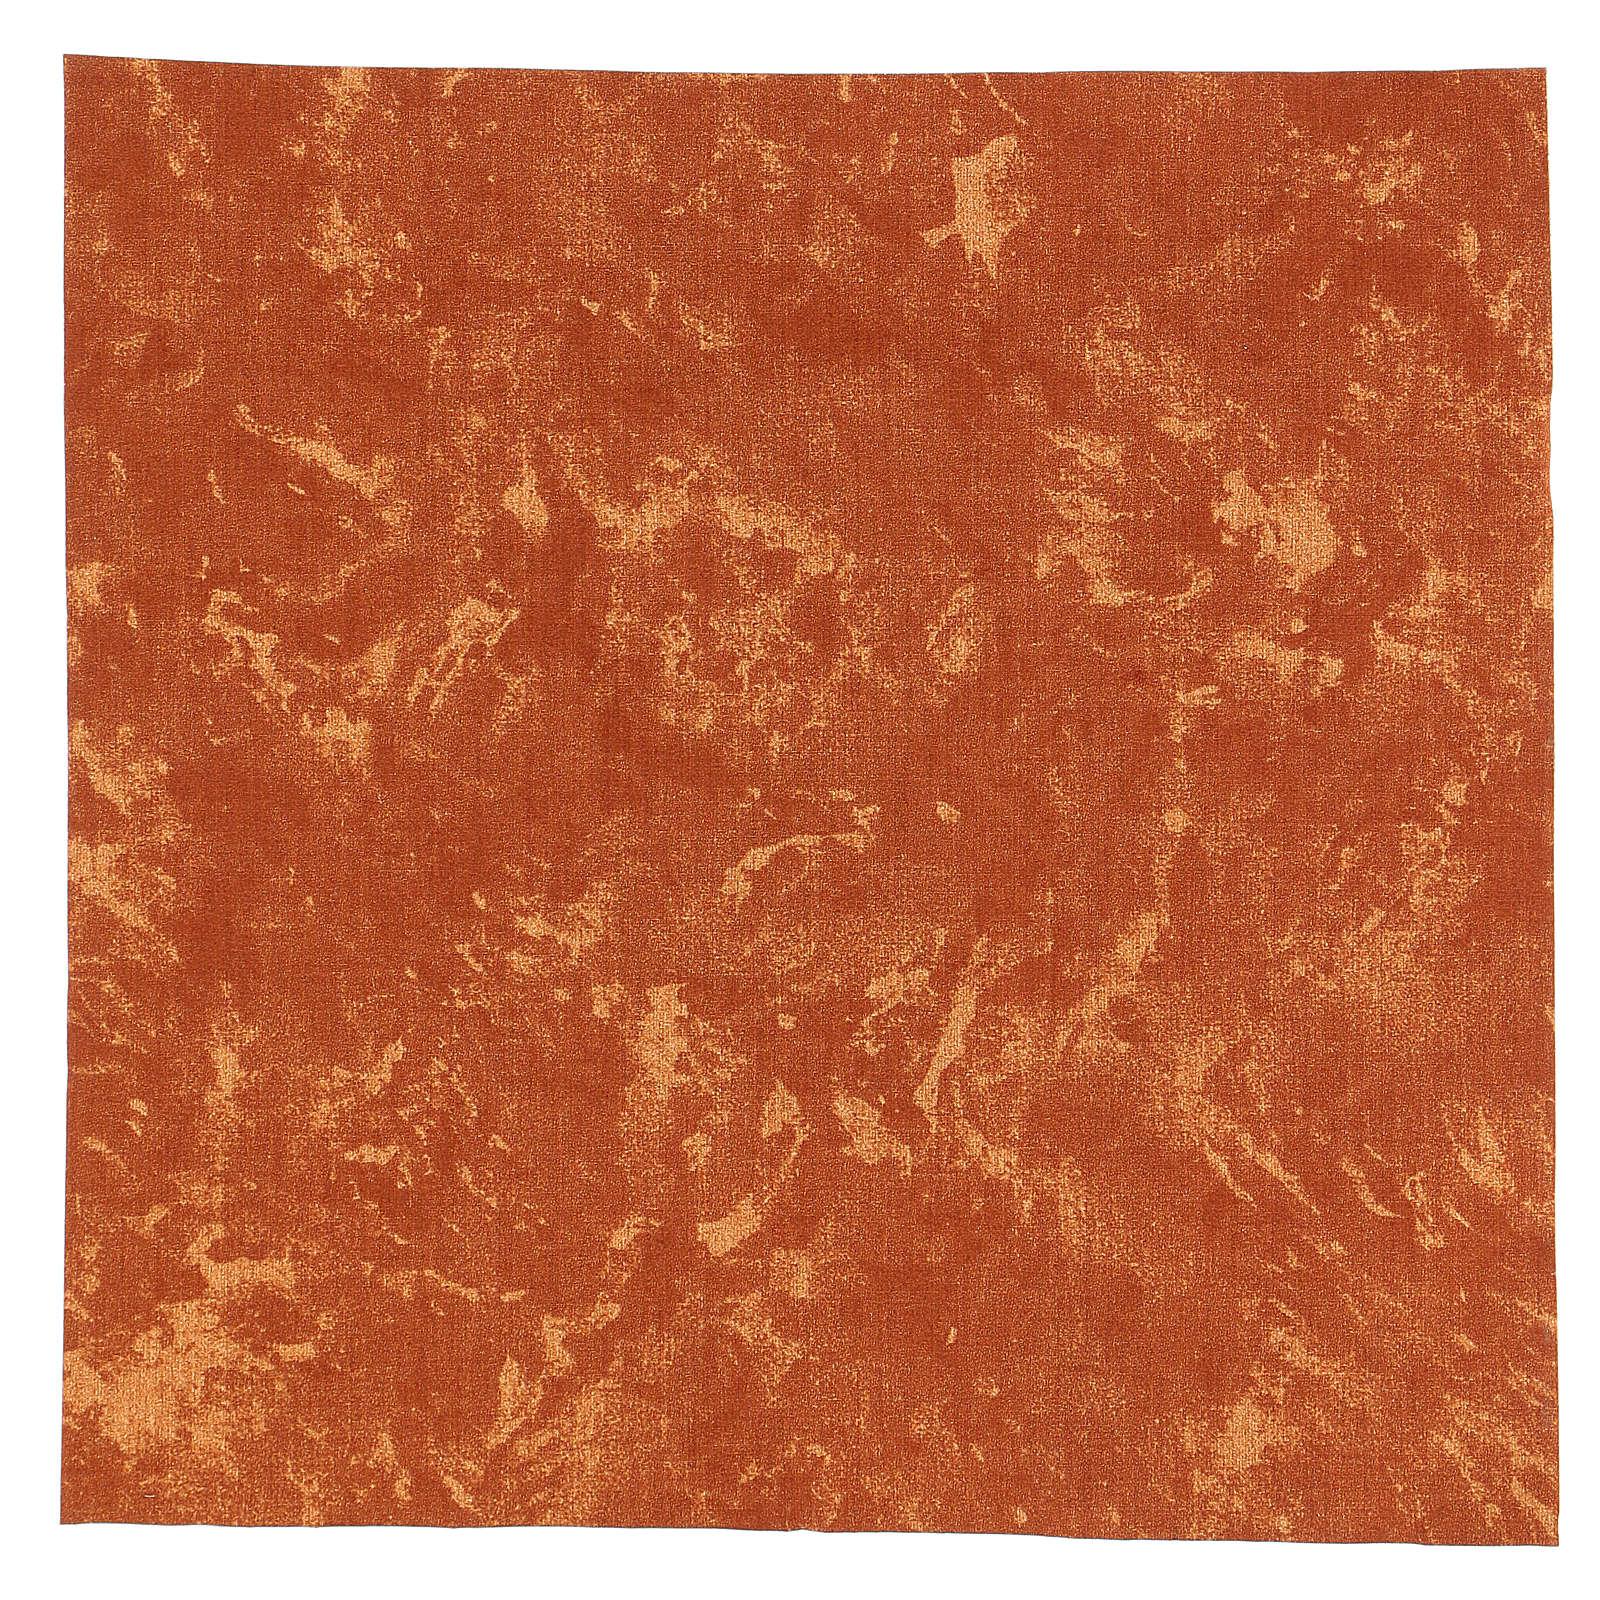 Nativity backdrop, red Earth 30x30 cm 4